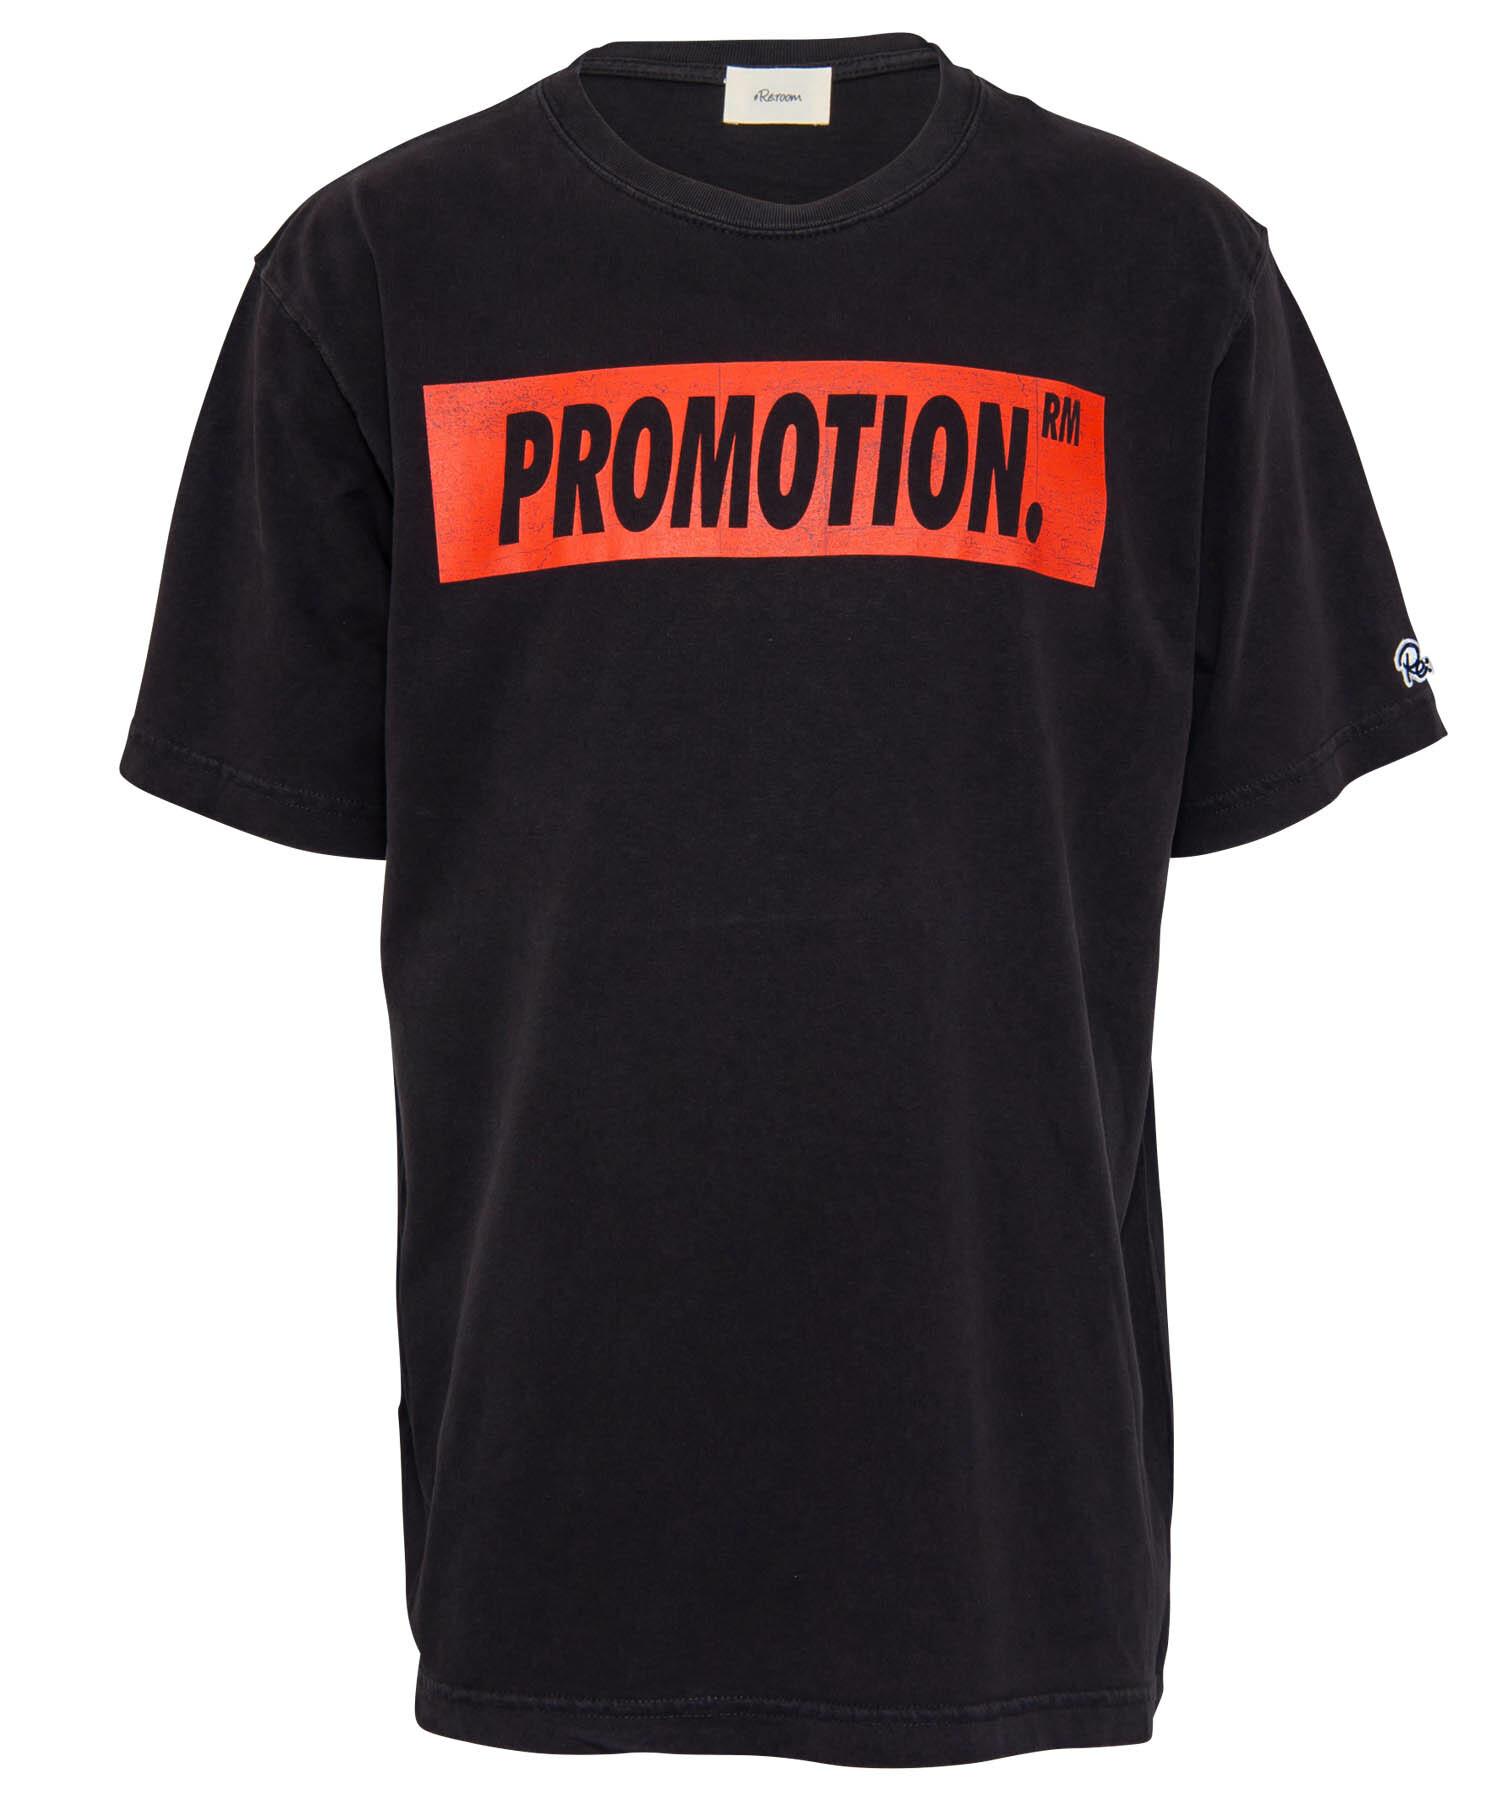 PROMOTION RM BOX LOGO T-shirt[REC293]